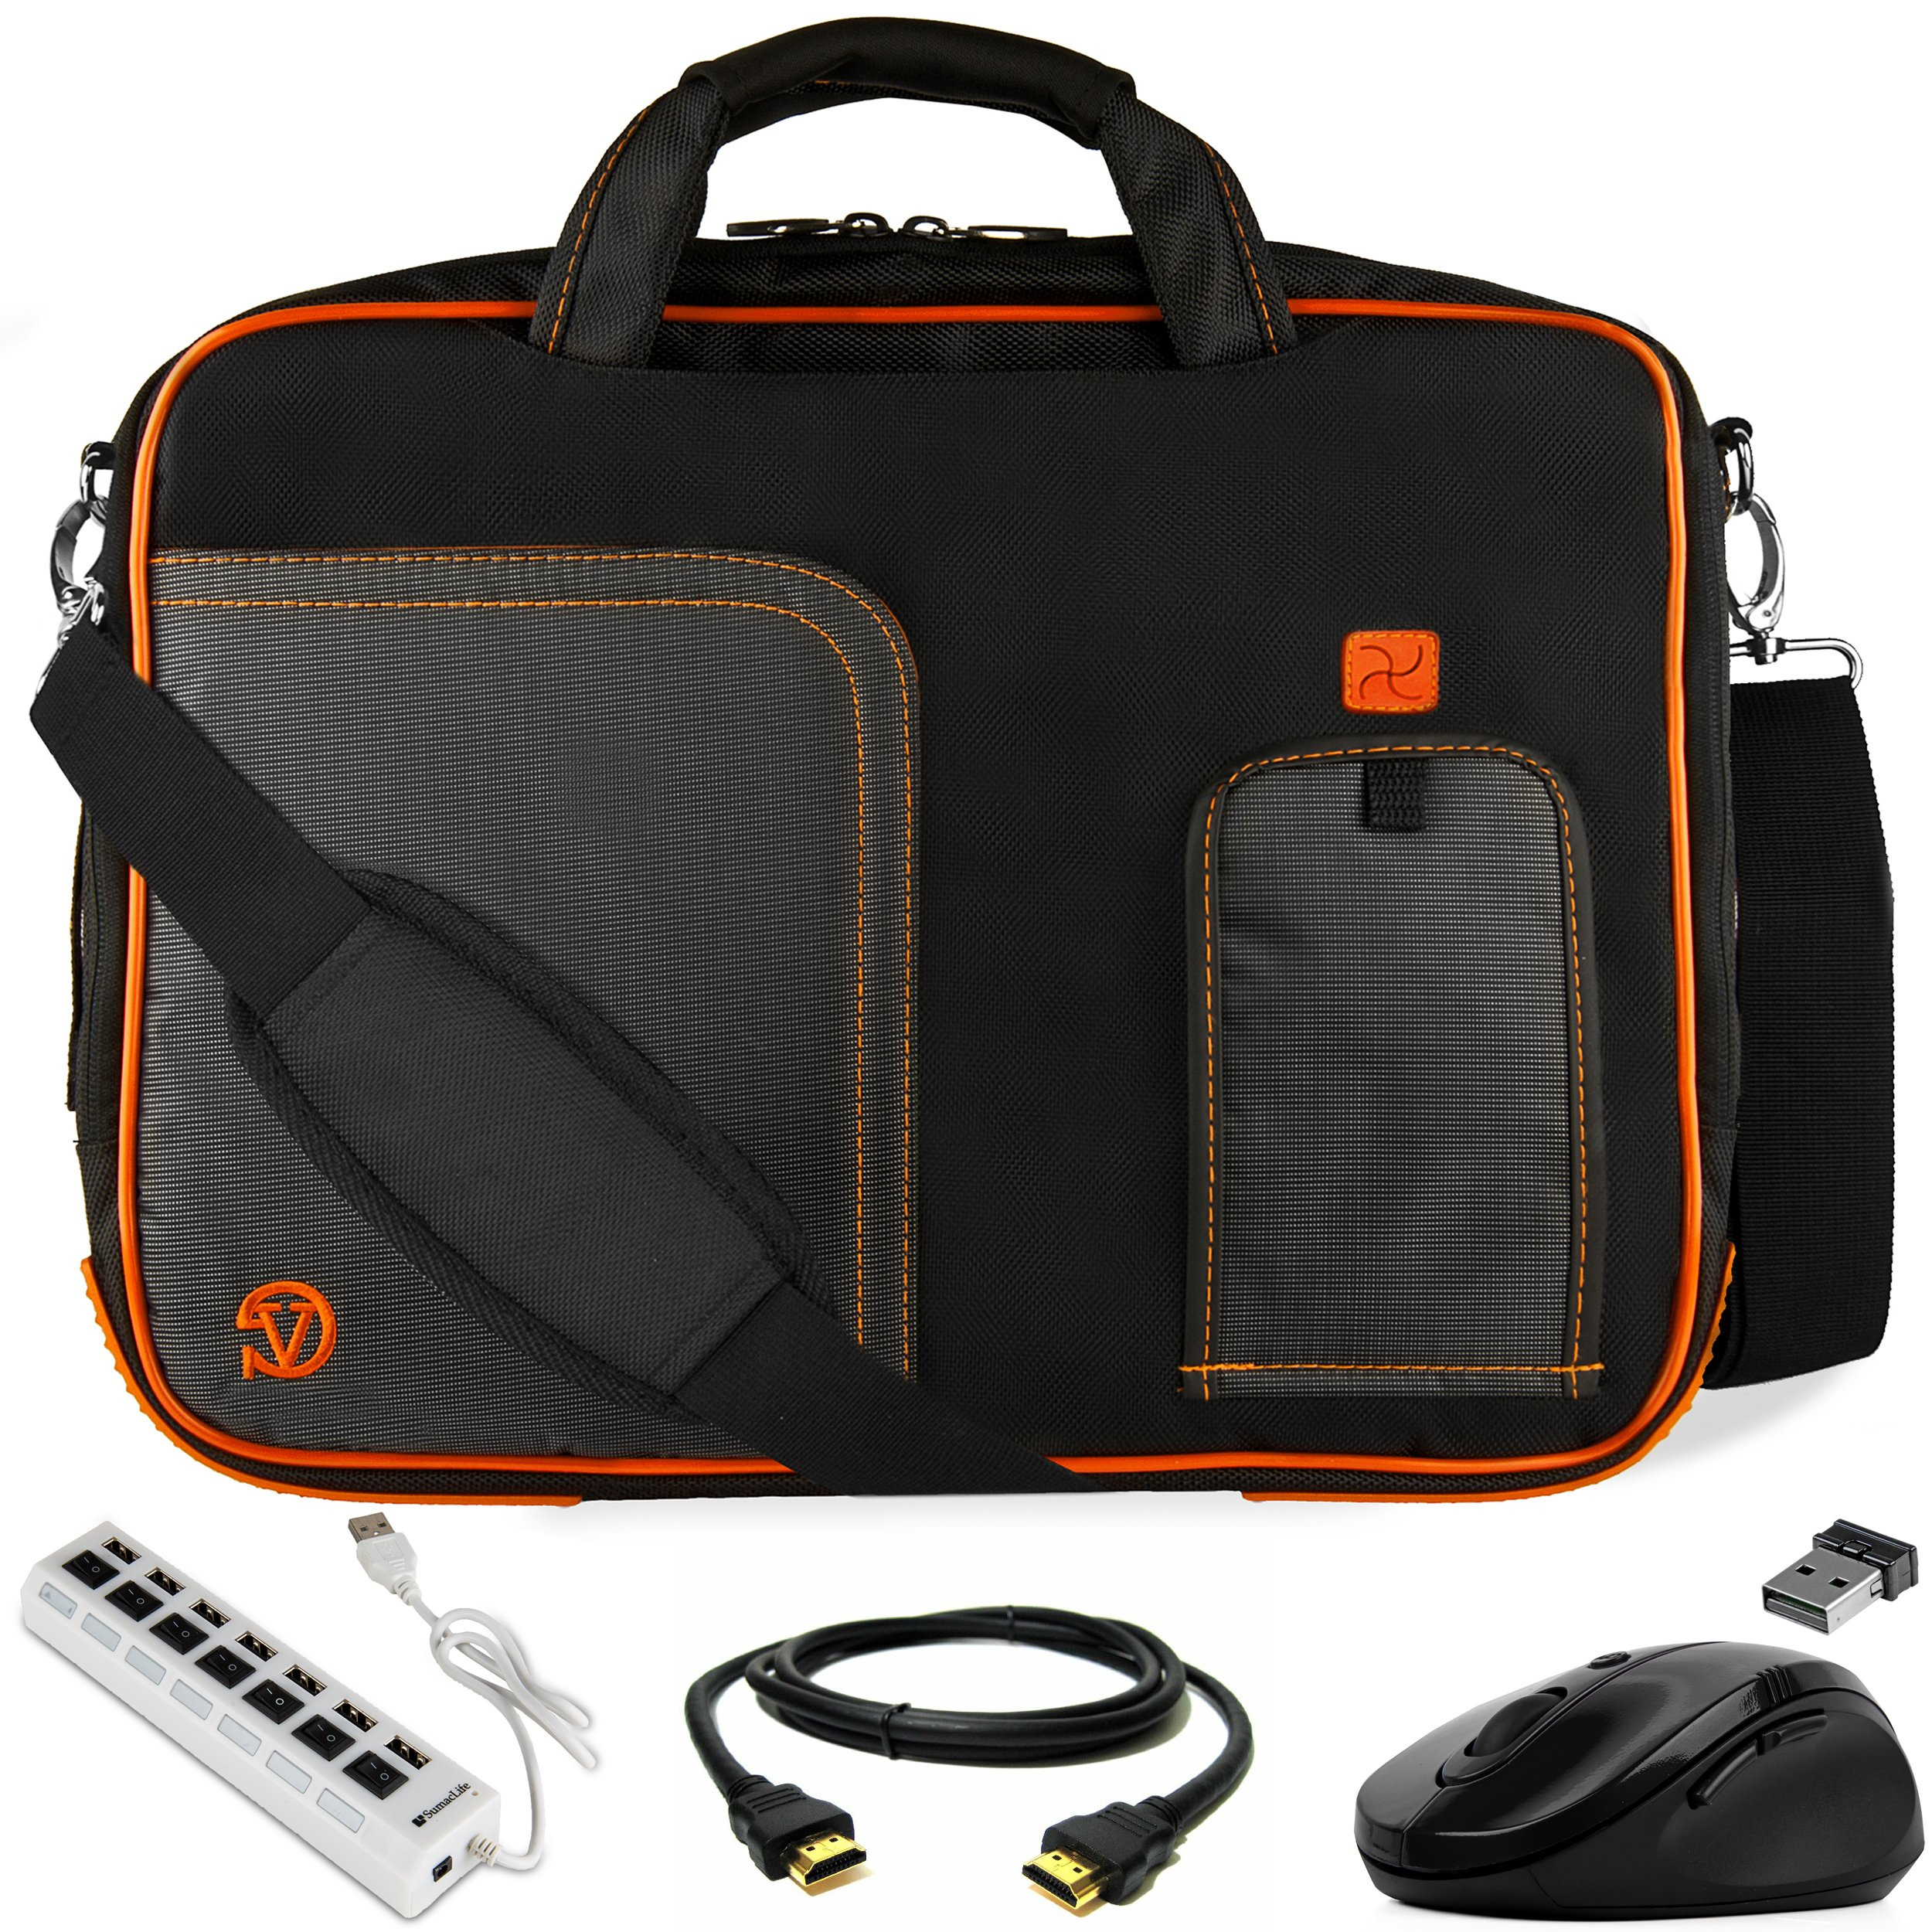 VanGoddy Orange Trim Laptop Bag w/HDMI Cable, USB HUB & Mouse for Acer Aspire/V Nitro/TravelMate 17.3inch Laptops